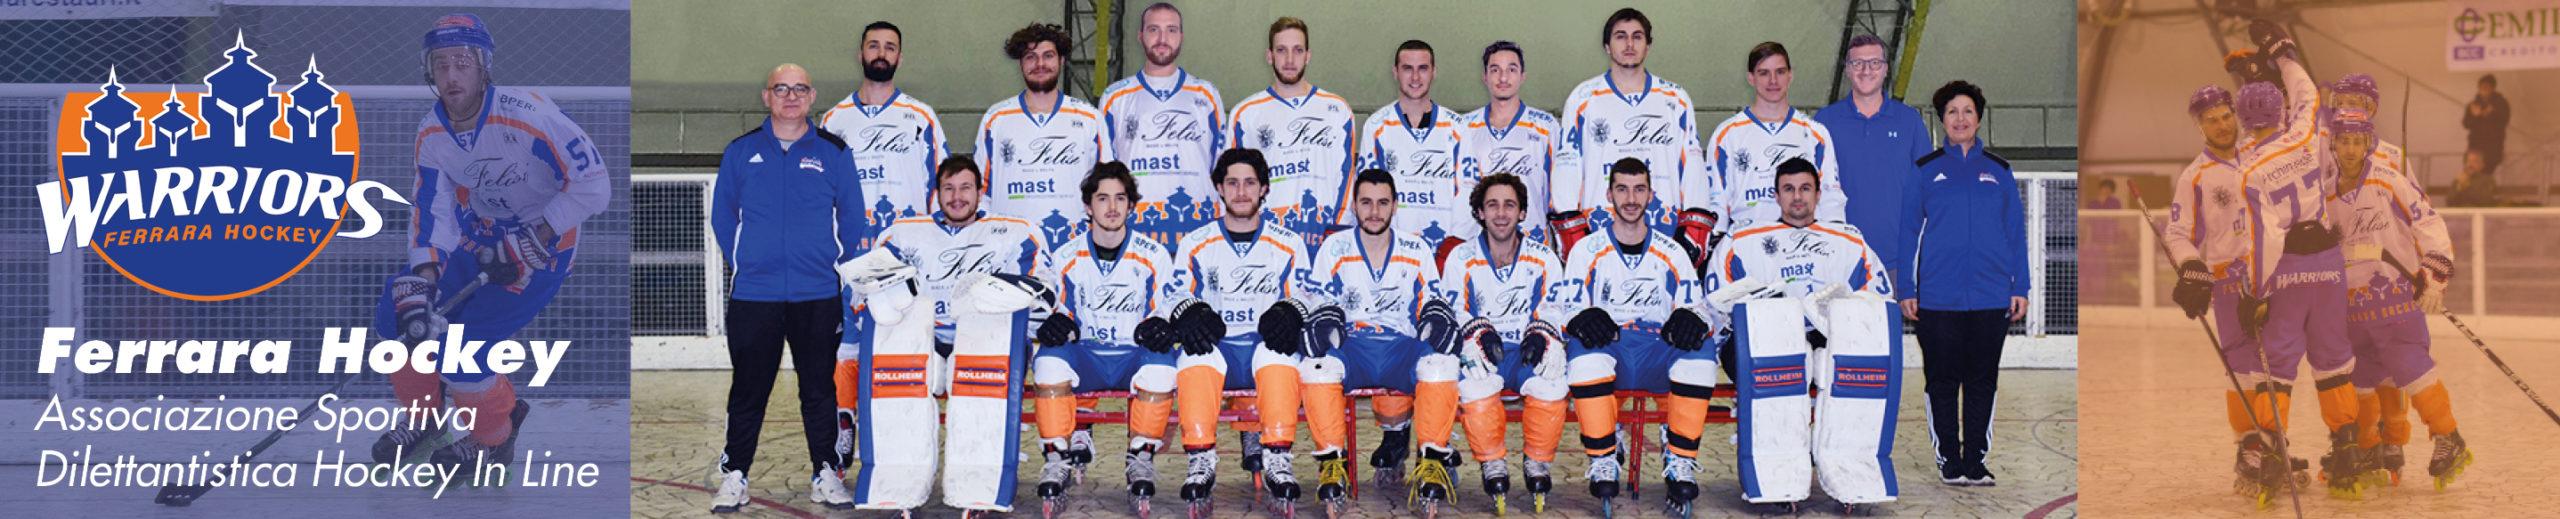 Ferrara Hockey